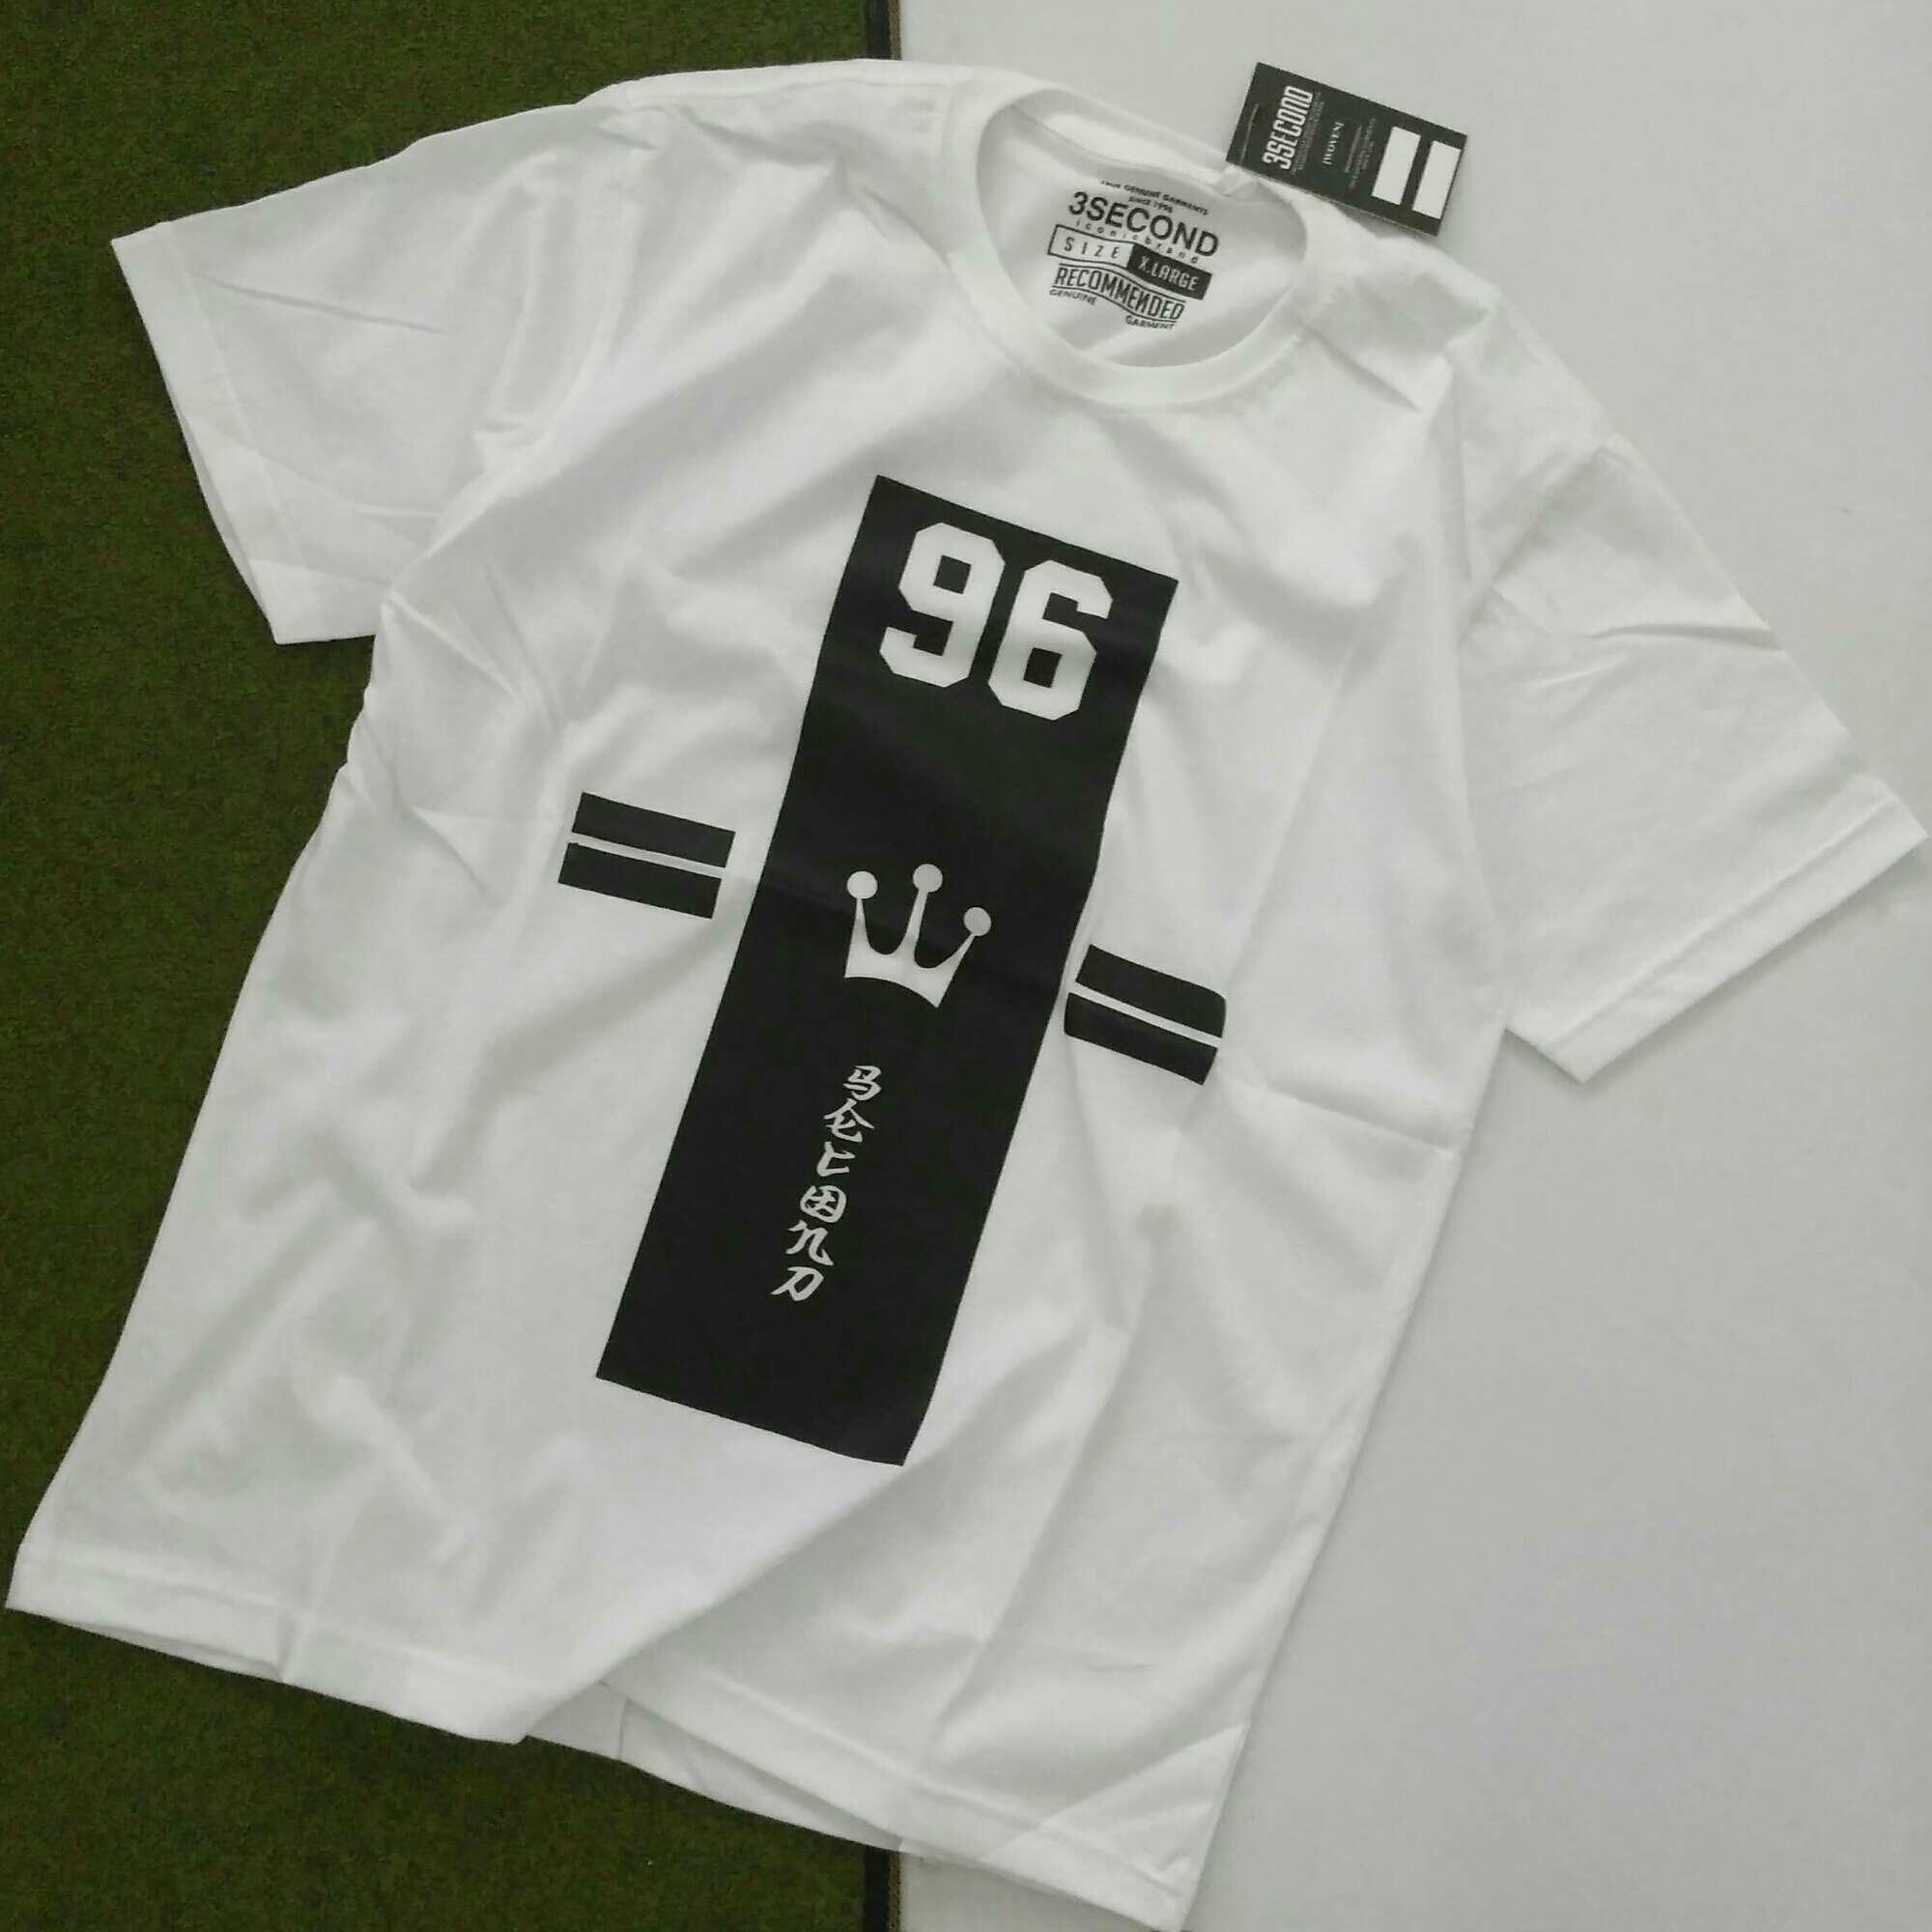 Rp 80.000. Kaos 3second Greenlight Pria Wanita Khusus Size XL Kaos Distro  Bandung Gratis Stiker Tshirt Bigsize Oblong CowokIDR80000 9d95fa8a02